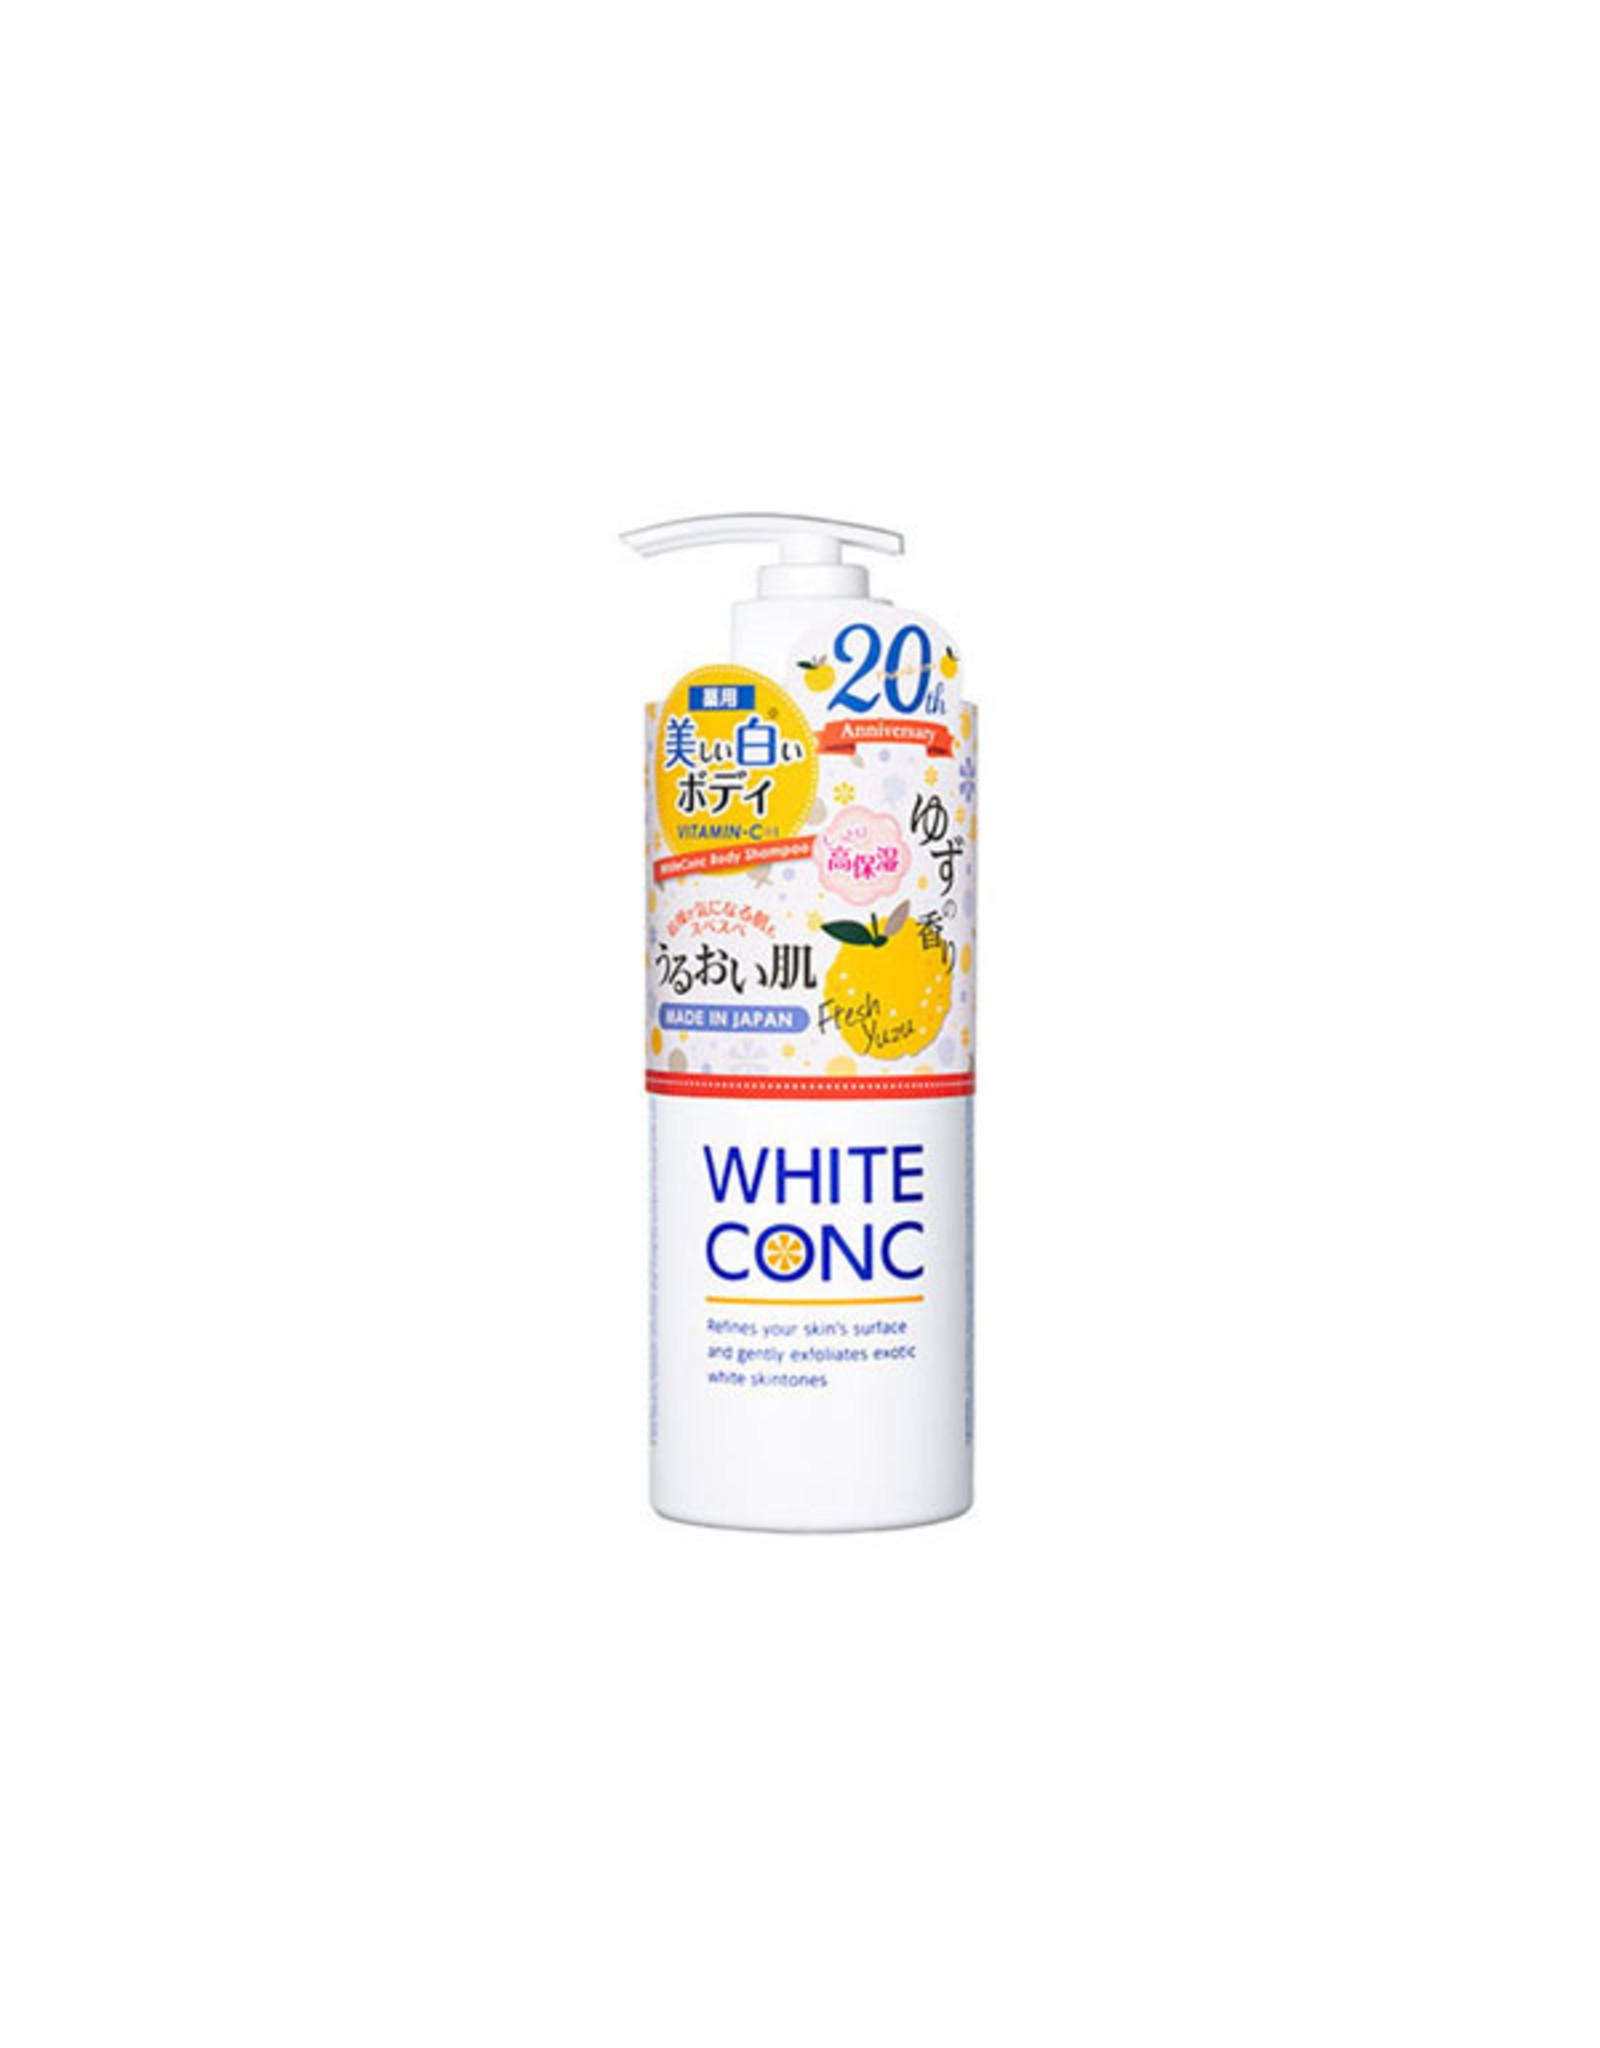 White Conc White Conc YUZU Limited Body Shampoo 600 ml